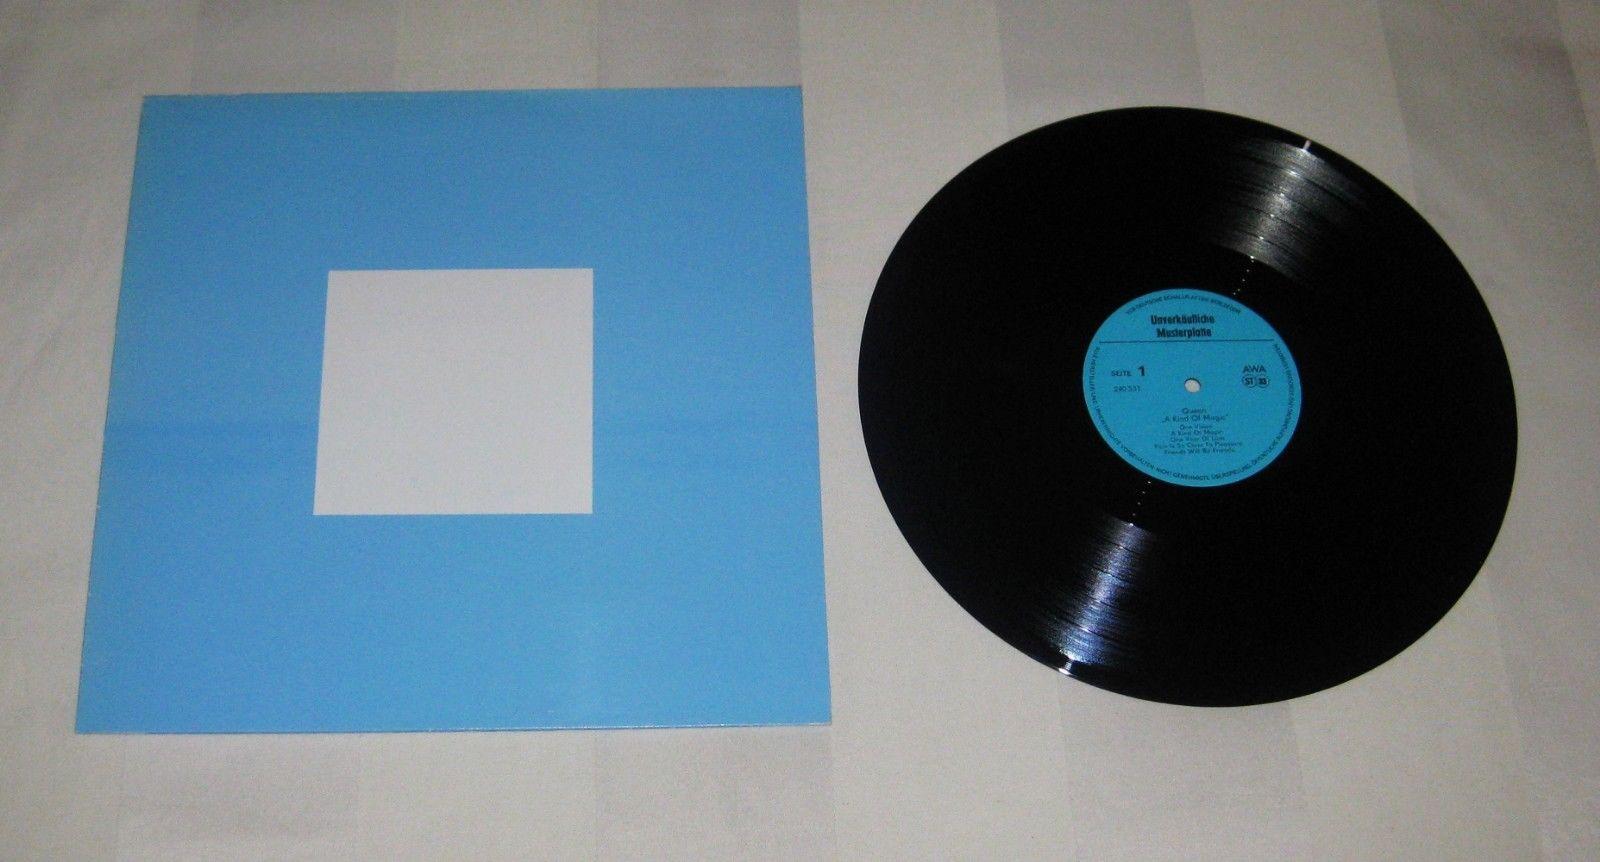 QUEEN : A Kind Of Magic, TEST PRESSING PROMO MUSTERPLATTTE Vinyl LP 1986 GDR